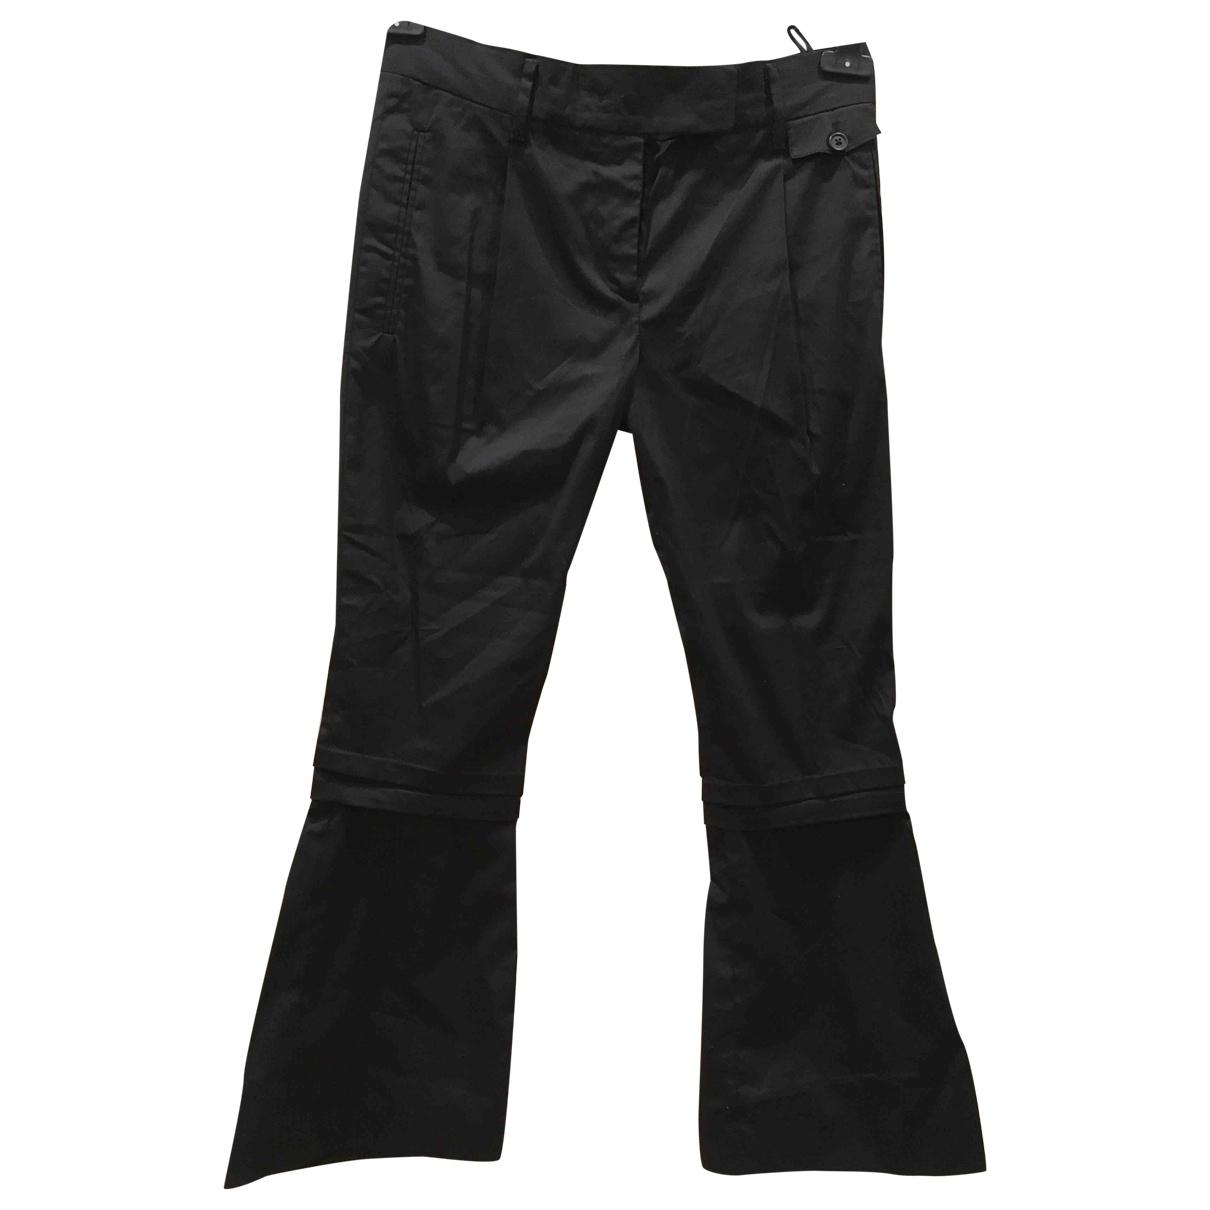 Prada \N Black Cotton Trousers for Women 38 IT